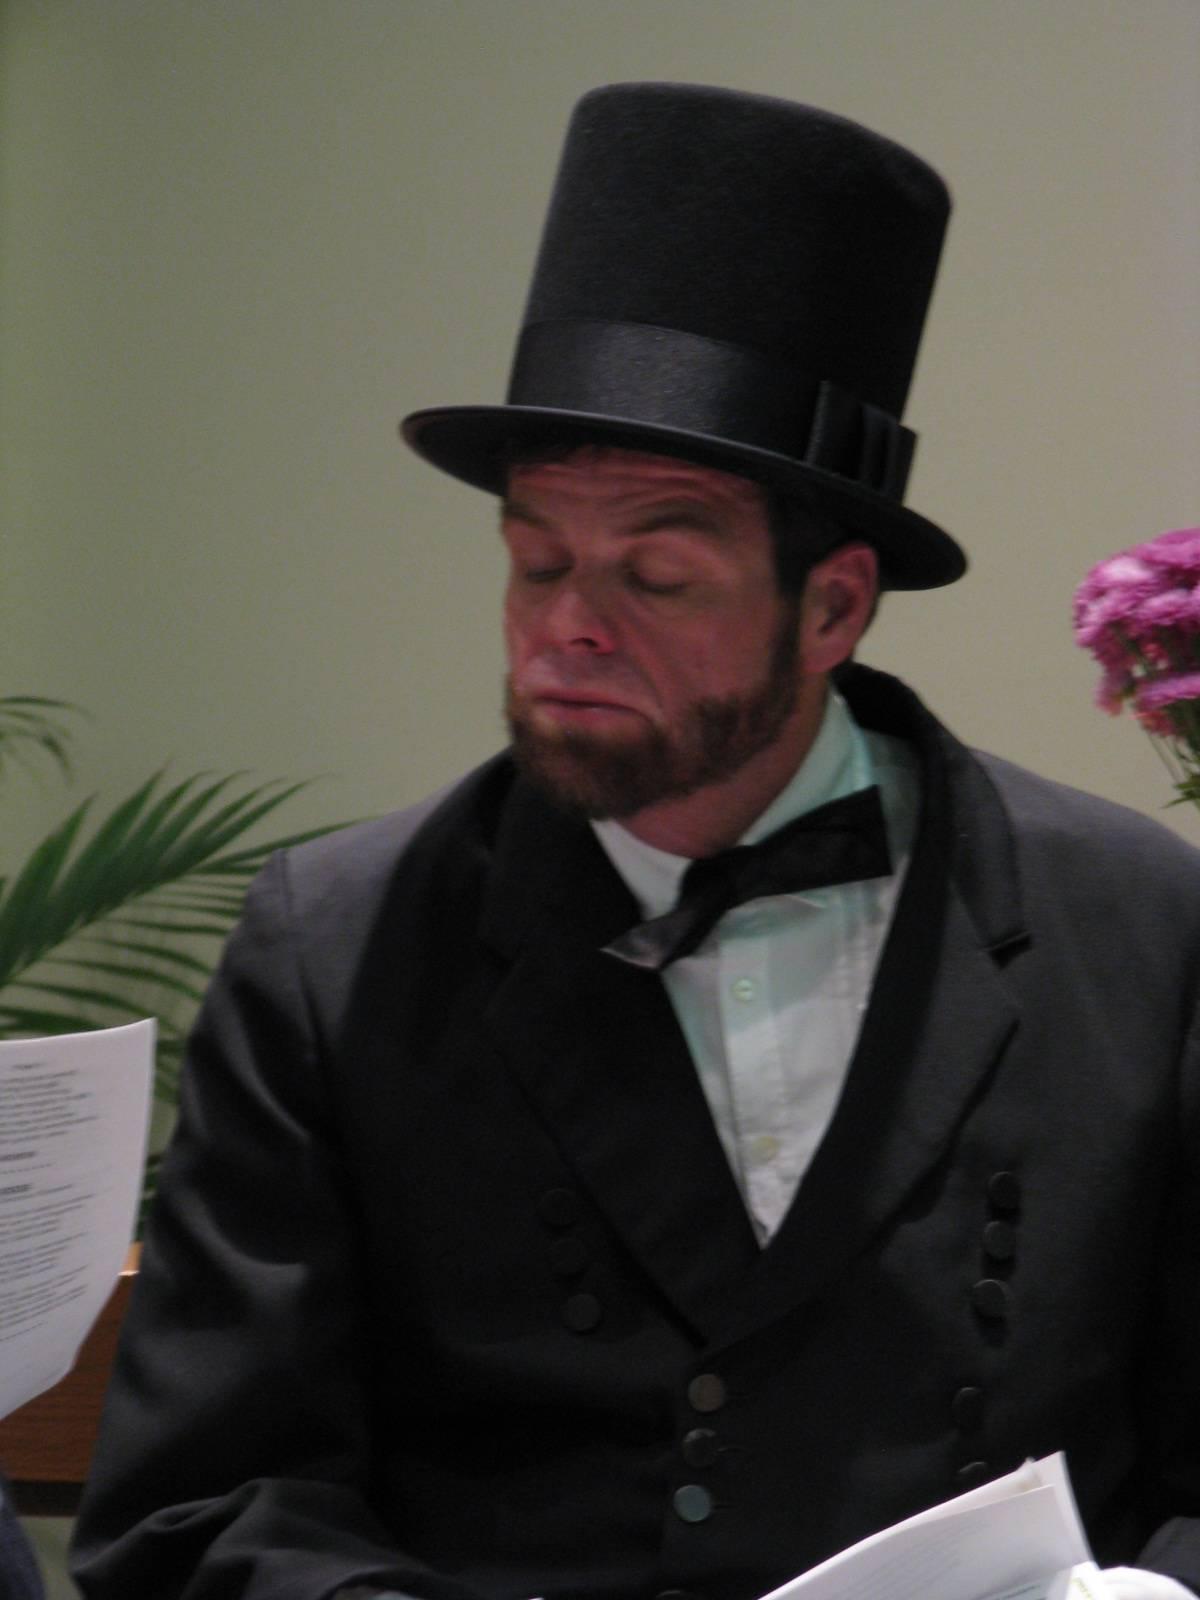 President Lincoln recites the Gettysburg Address